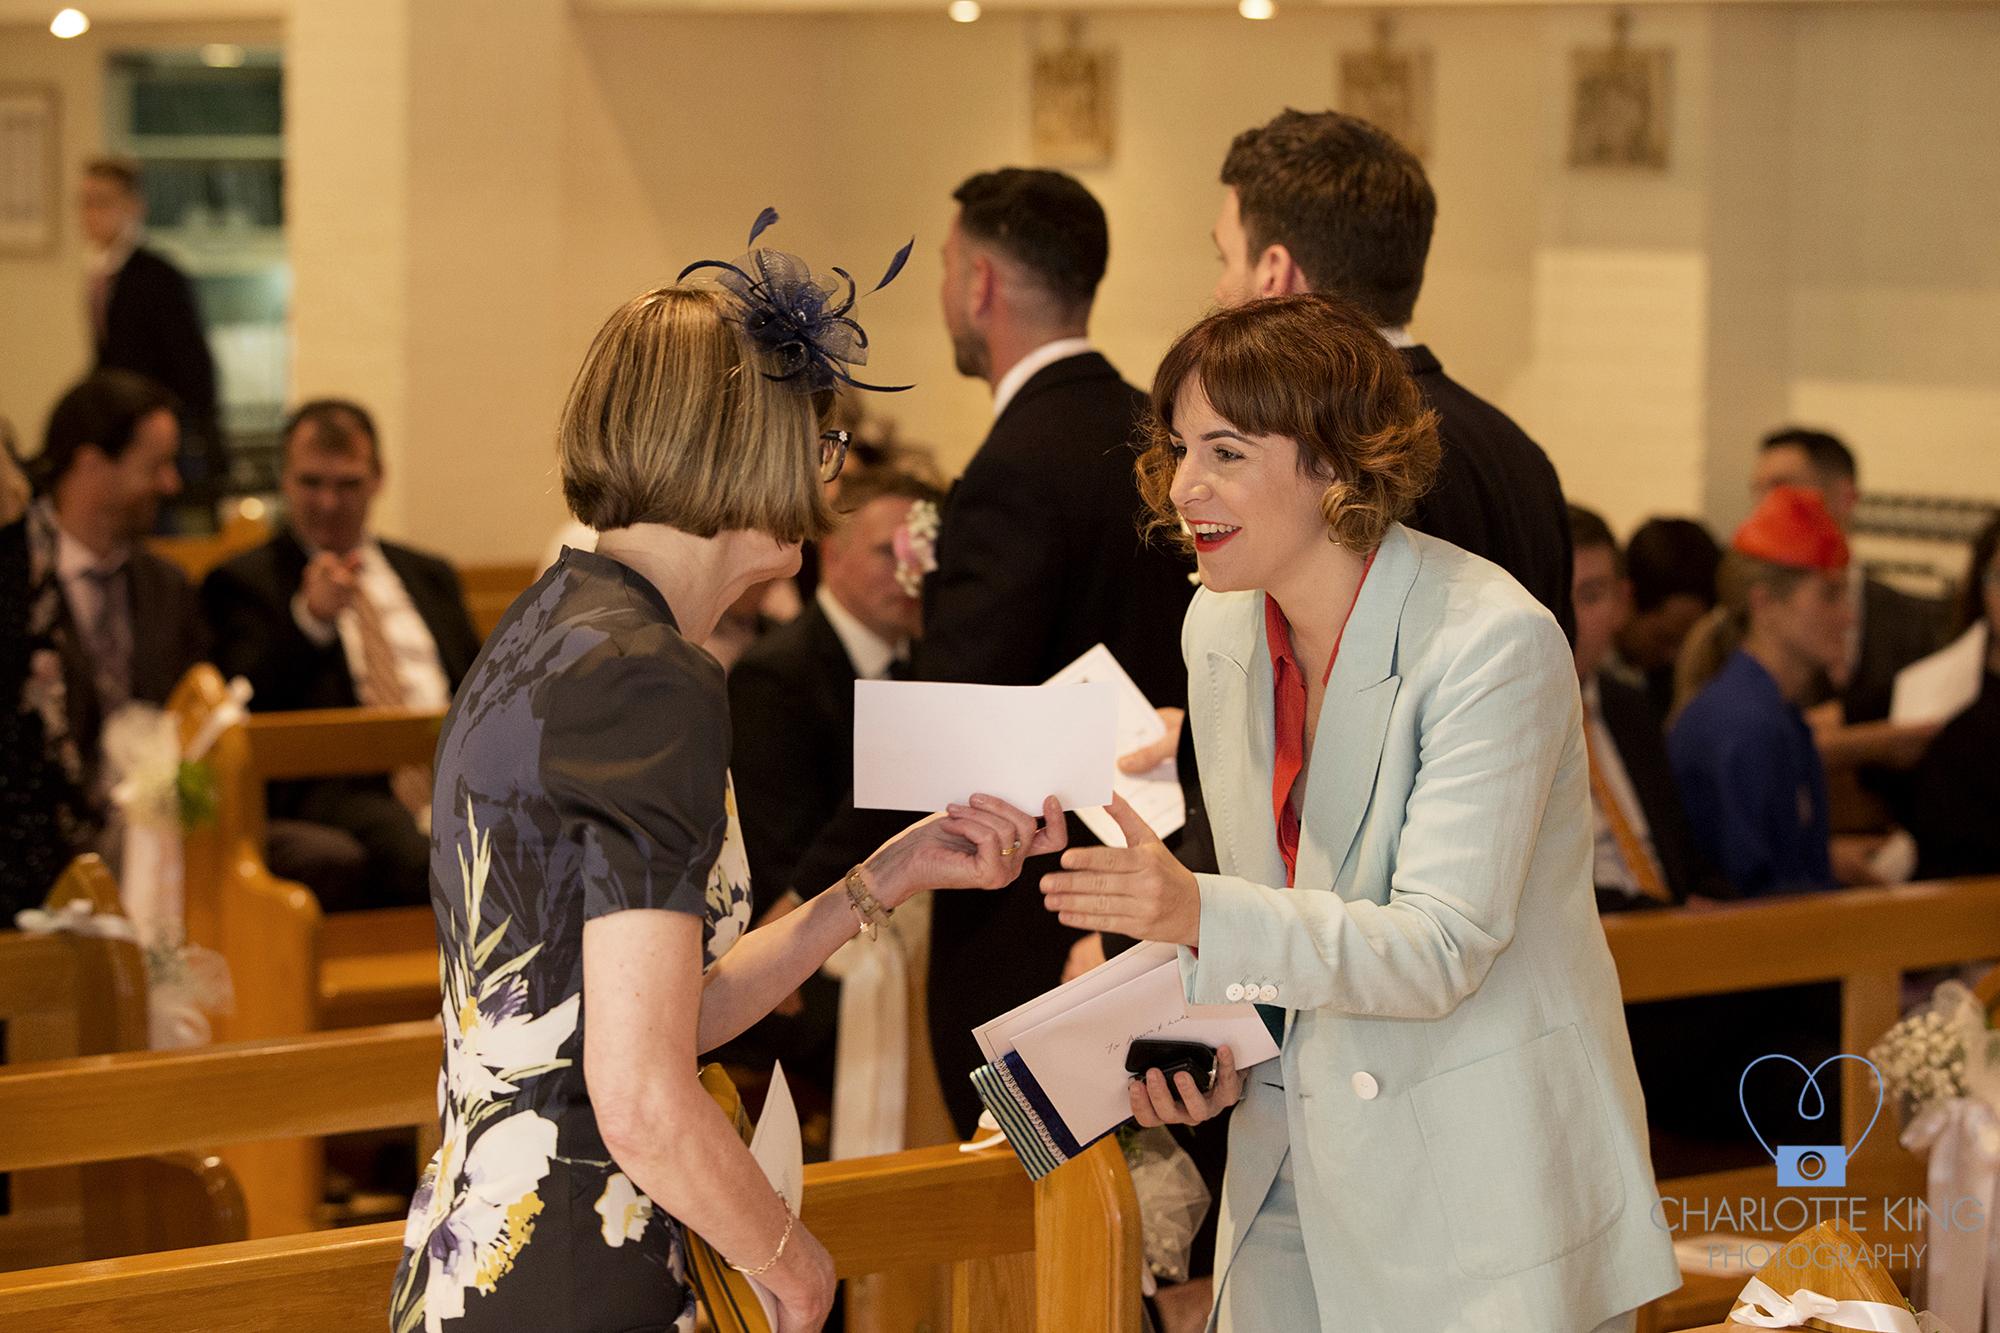 Woldingham-school-wedding-charlotte-king-photography (31)